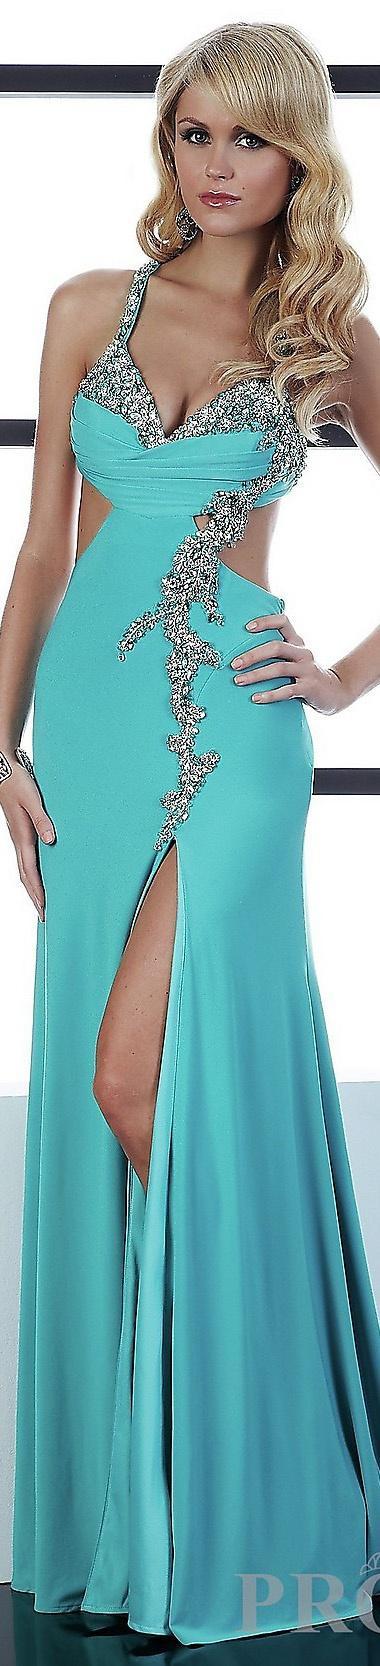 Tiffany Blaue Hochzeits- - Formal Langes Kleid #2068314 - Weddbook